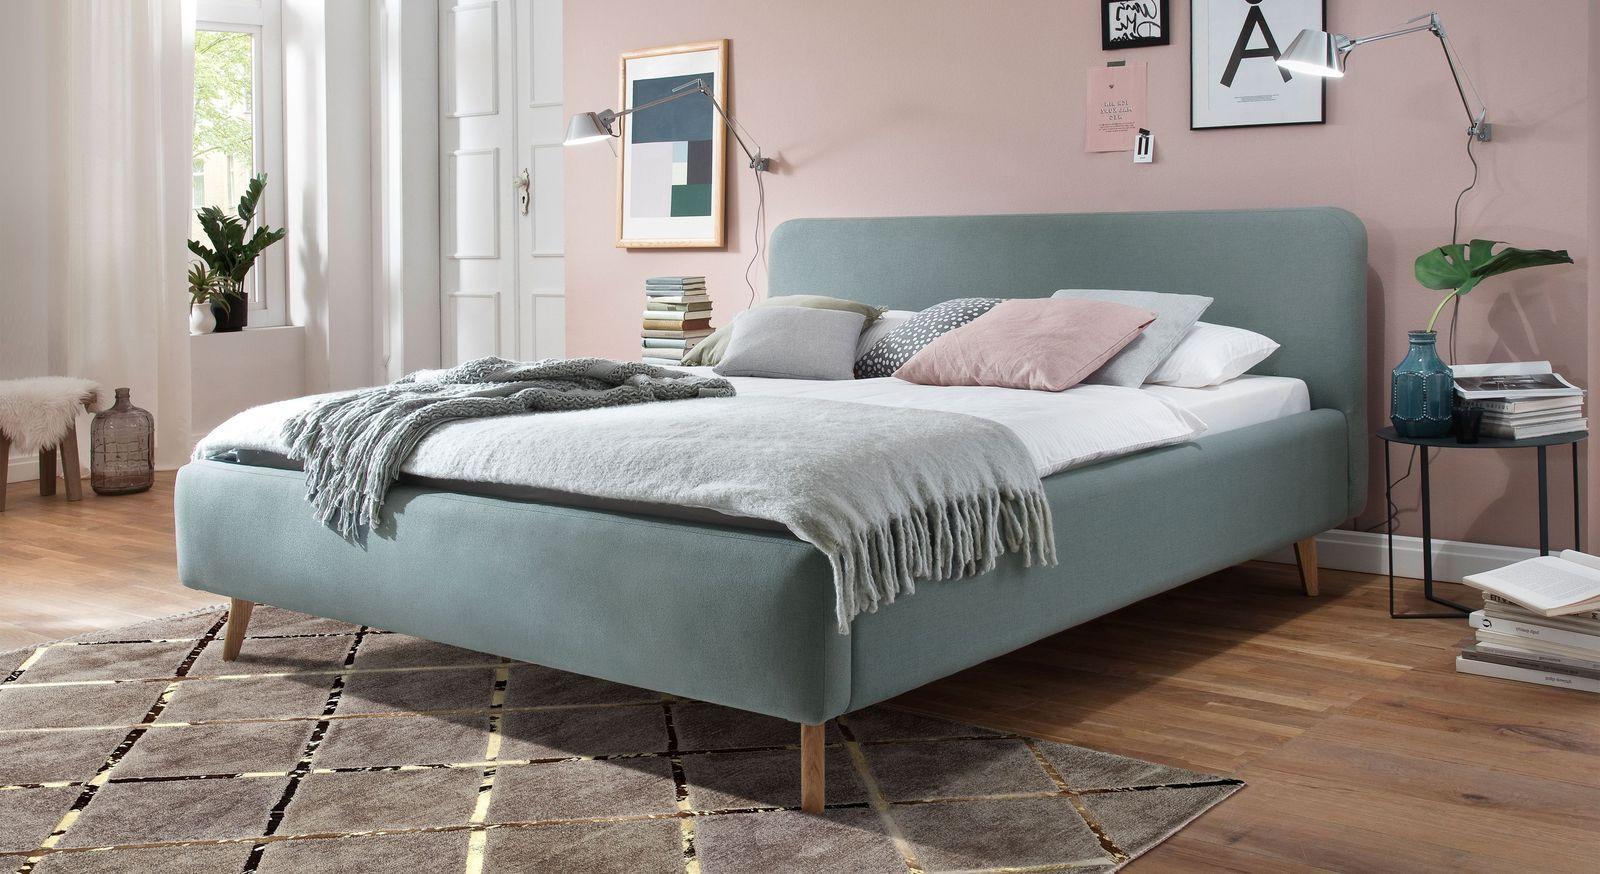 Bett Carballo In 2020 Polsterbett Bett Und Haus Deko